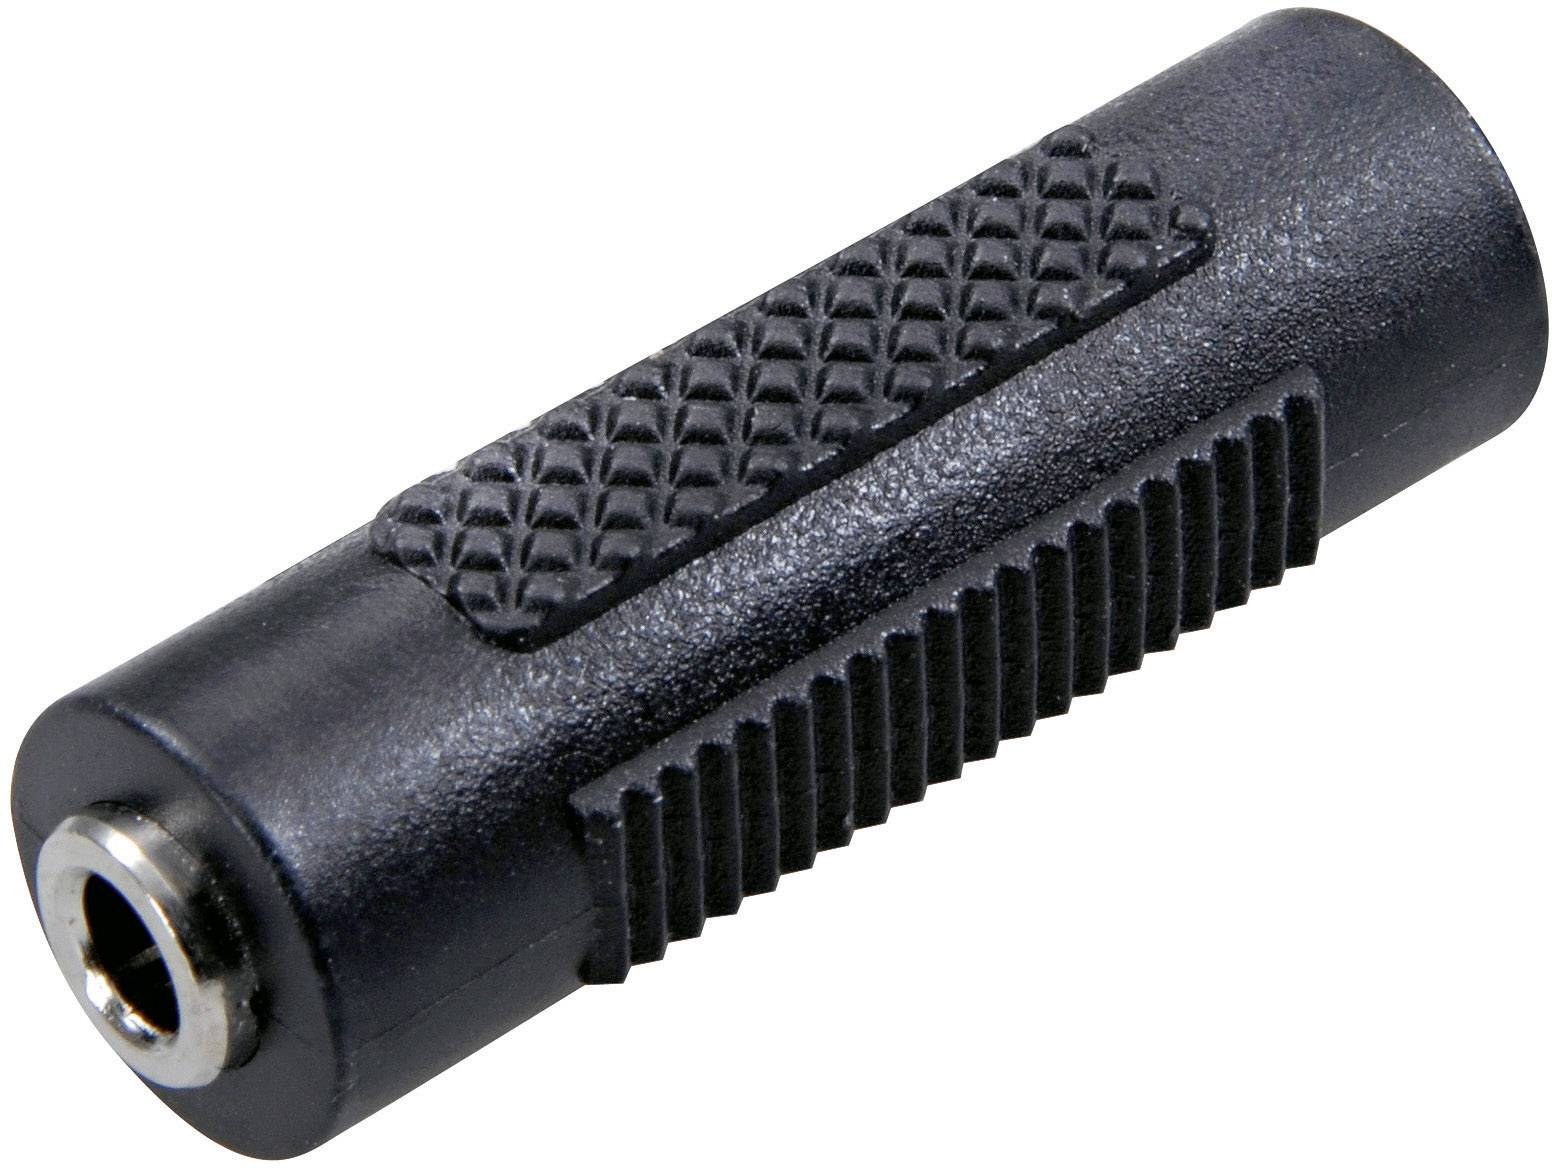 Jack audio adaptér SpeaKa, jack zásuvka 3,5 mm / jack zásuvka 3,5 mm